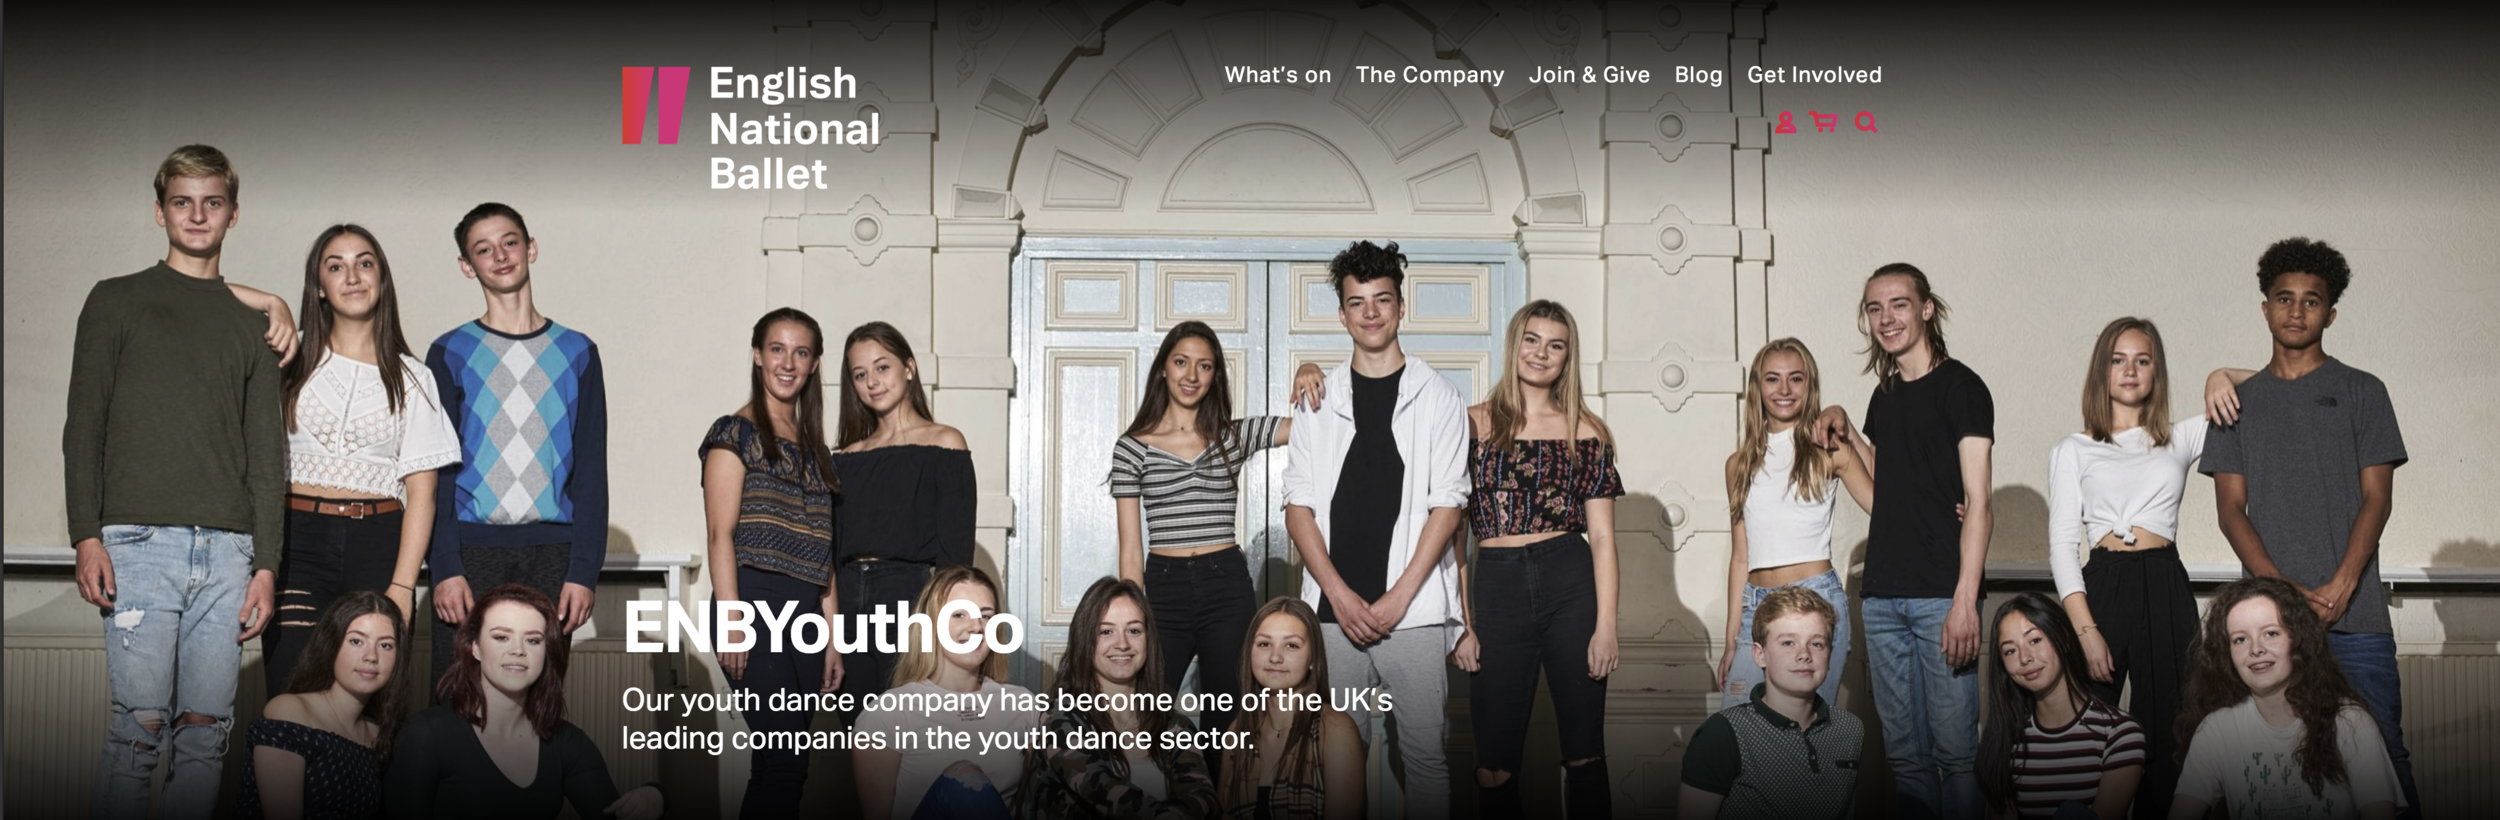 ENBYouthCo_English_National_Ballet_Youth_Company_photo_Danilo_Moroni.png